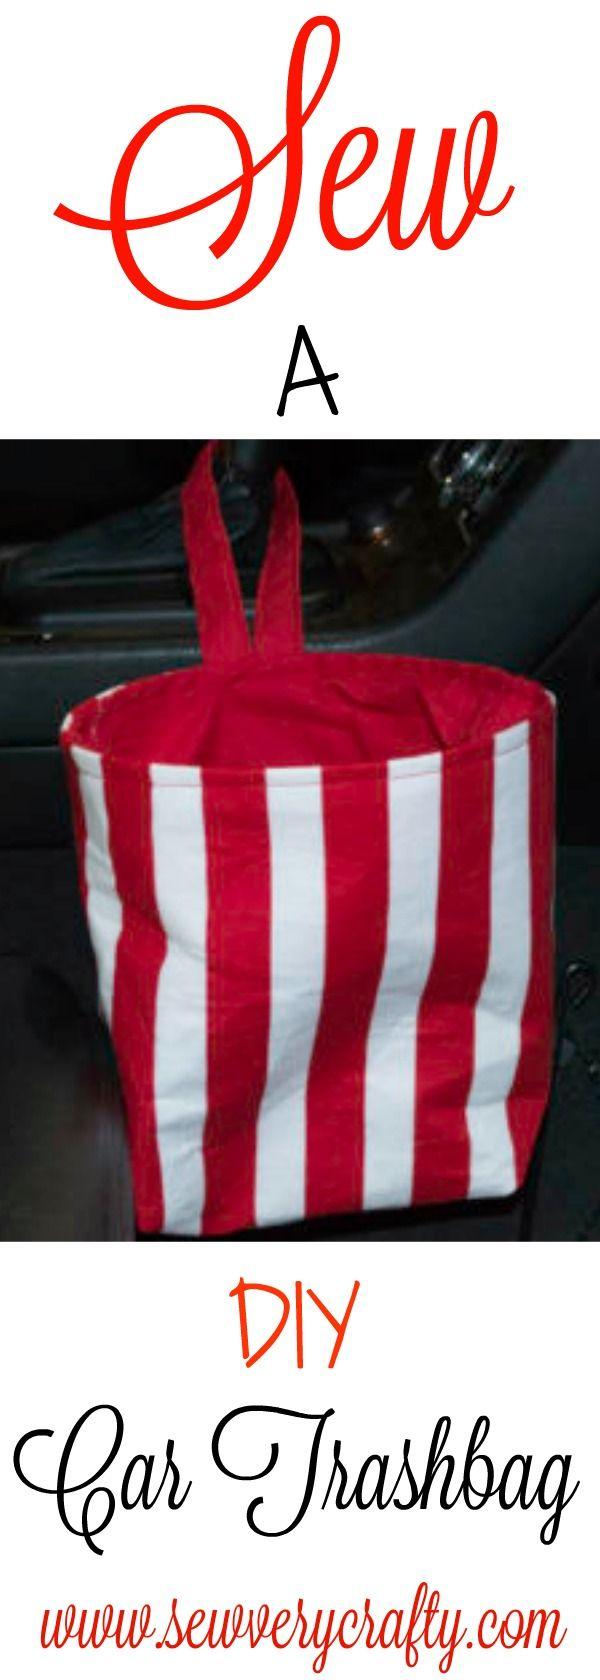 Sew an easy DIY car trash bag. Free pattern and tutorial.  #sew #cartrashbag #trashbag #tutorial #pattern